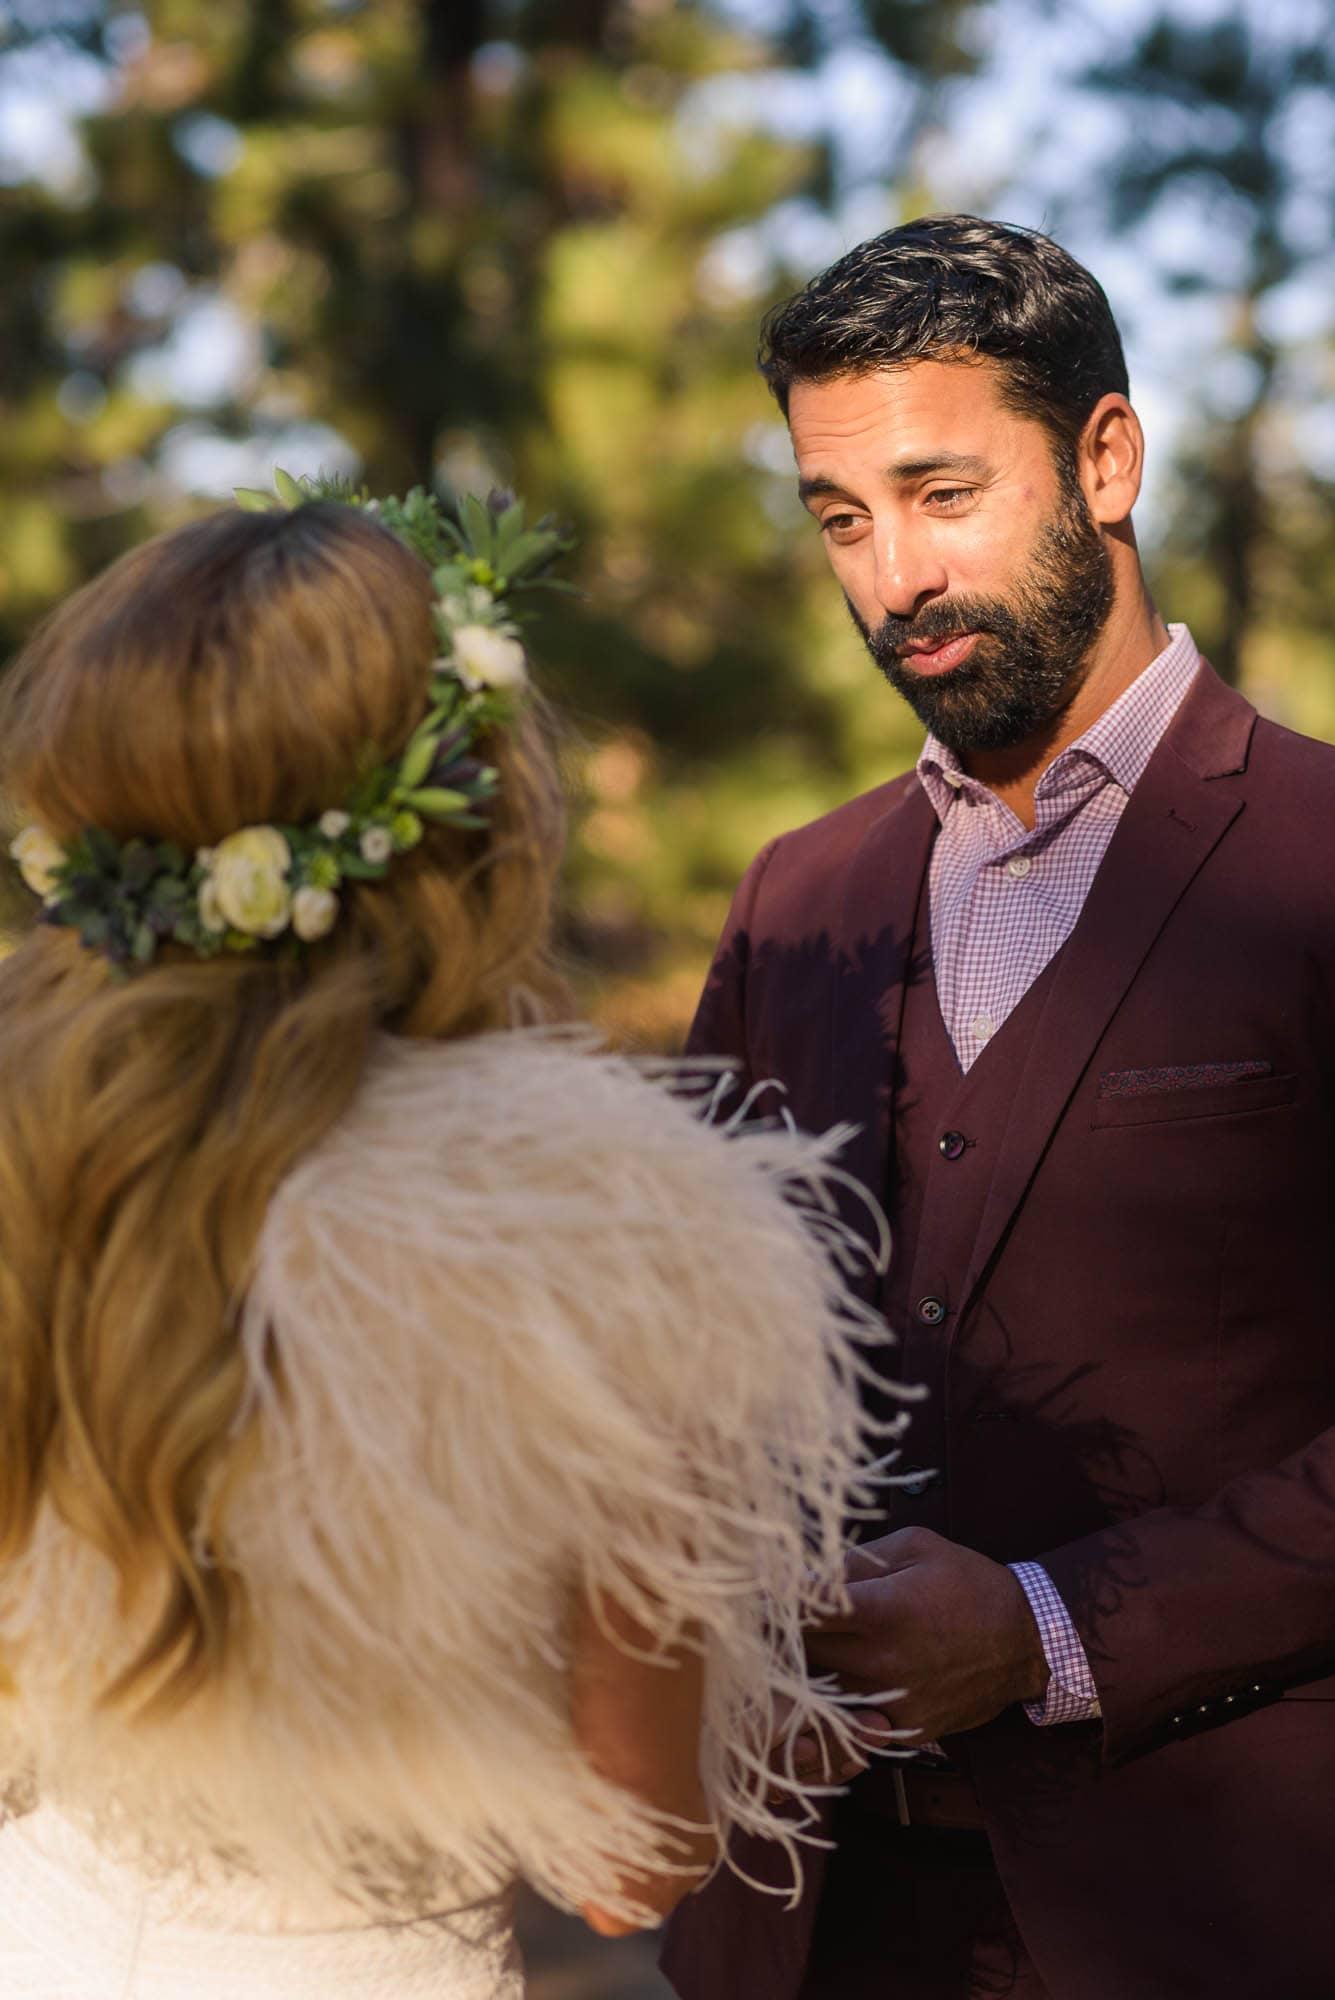 022_Alan_and_Heidi_Wedding_Natalie_Mike